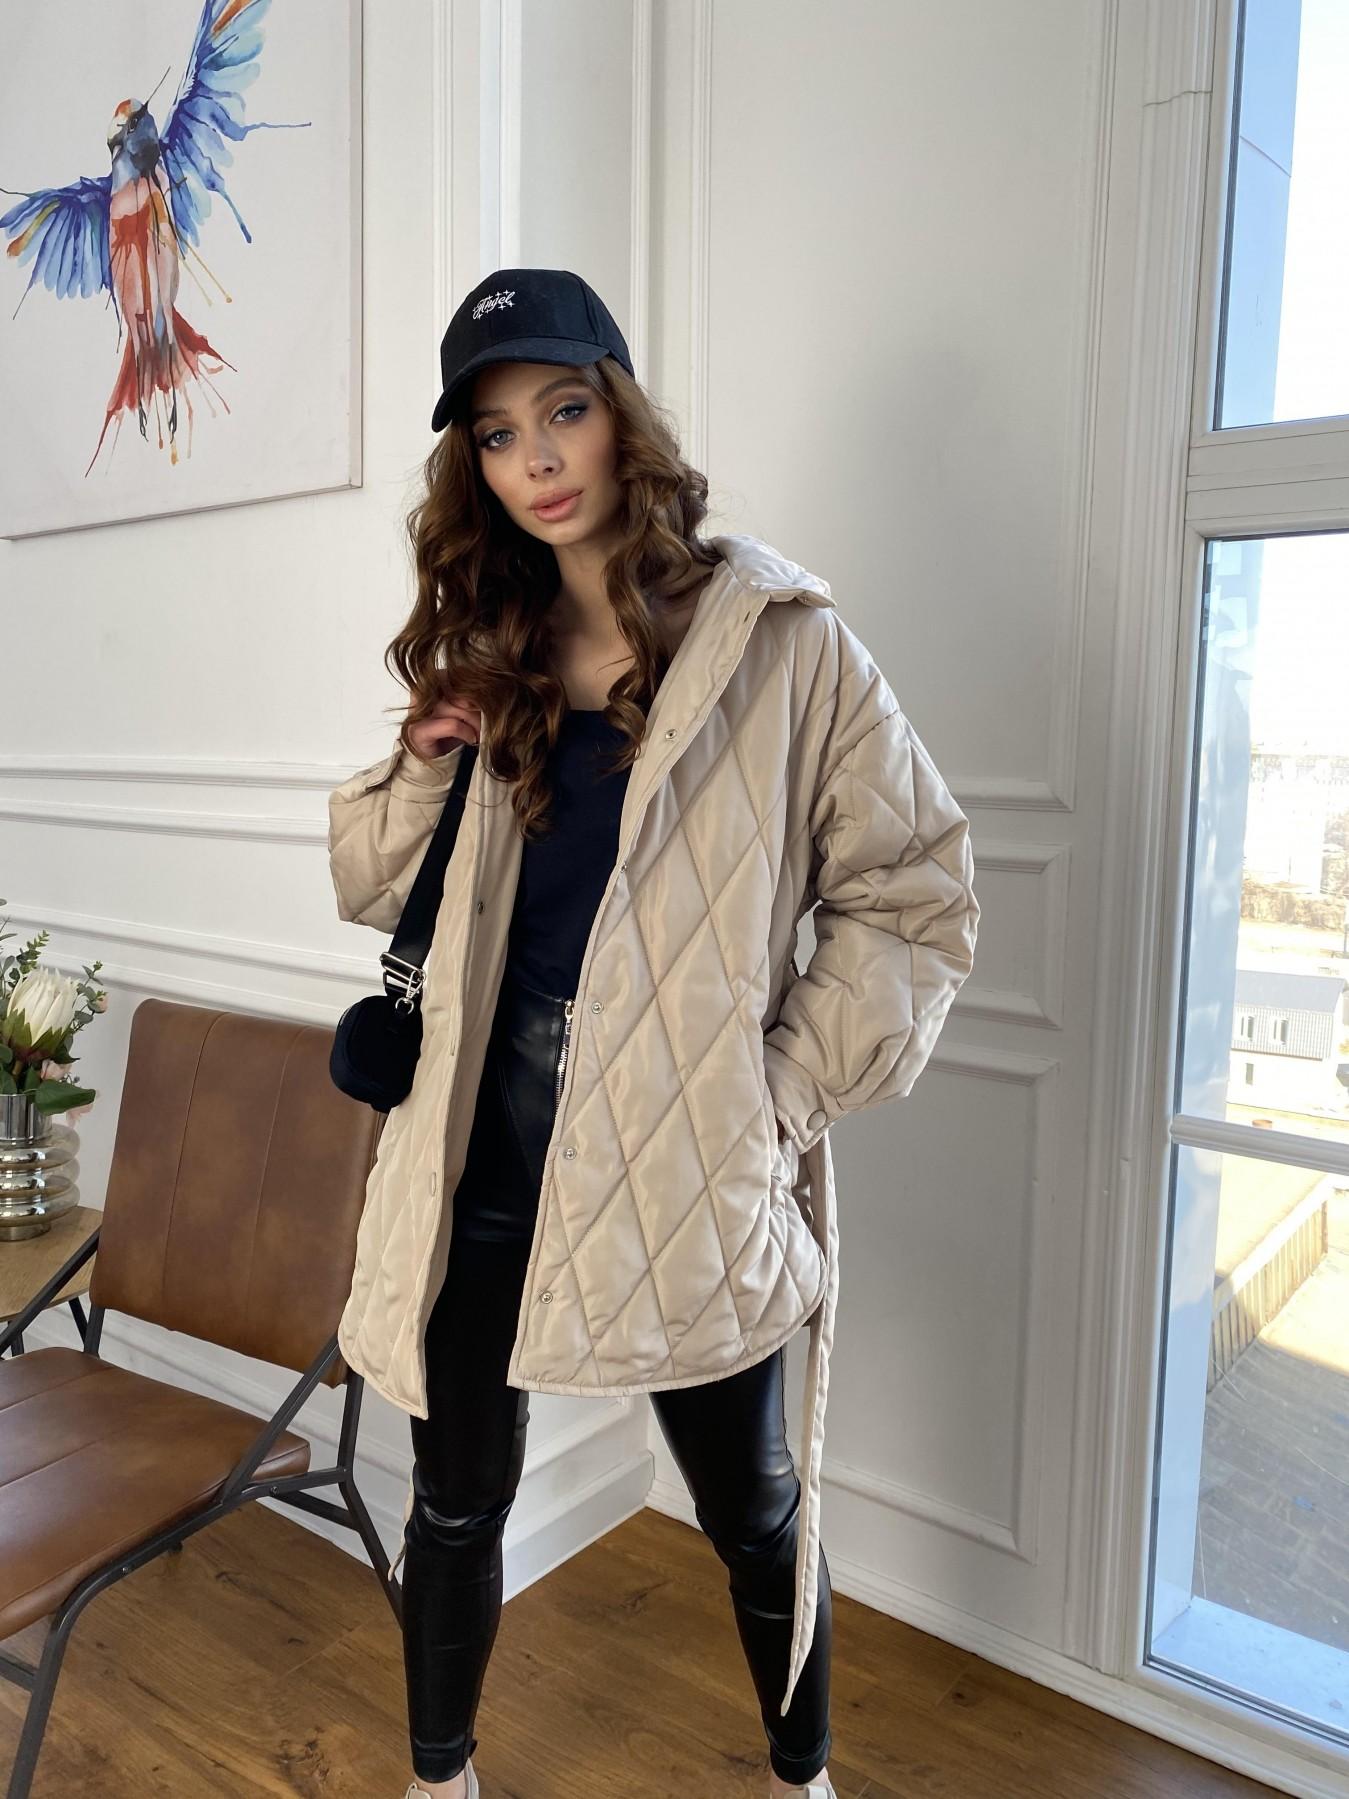 Пазл стеганая куртка из плащевки 10890 АРТ. 47449 Цвет: Бежевый - фото 1, интернет магазин tm-modus.ru